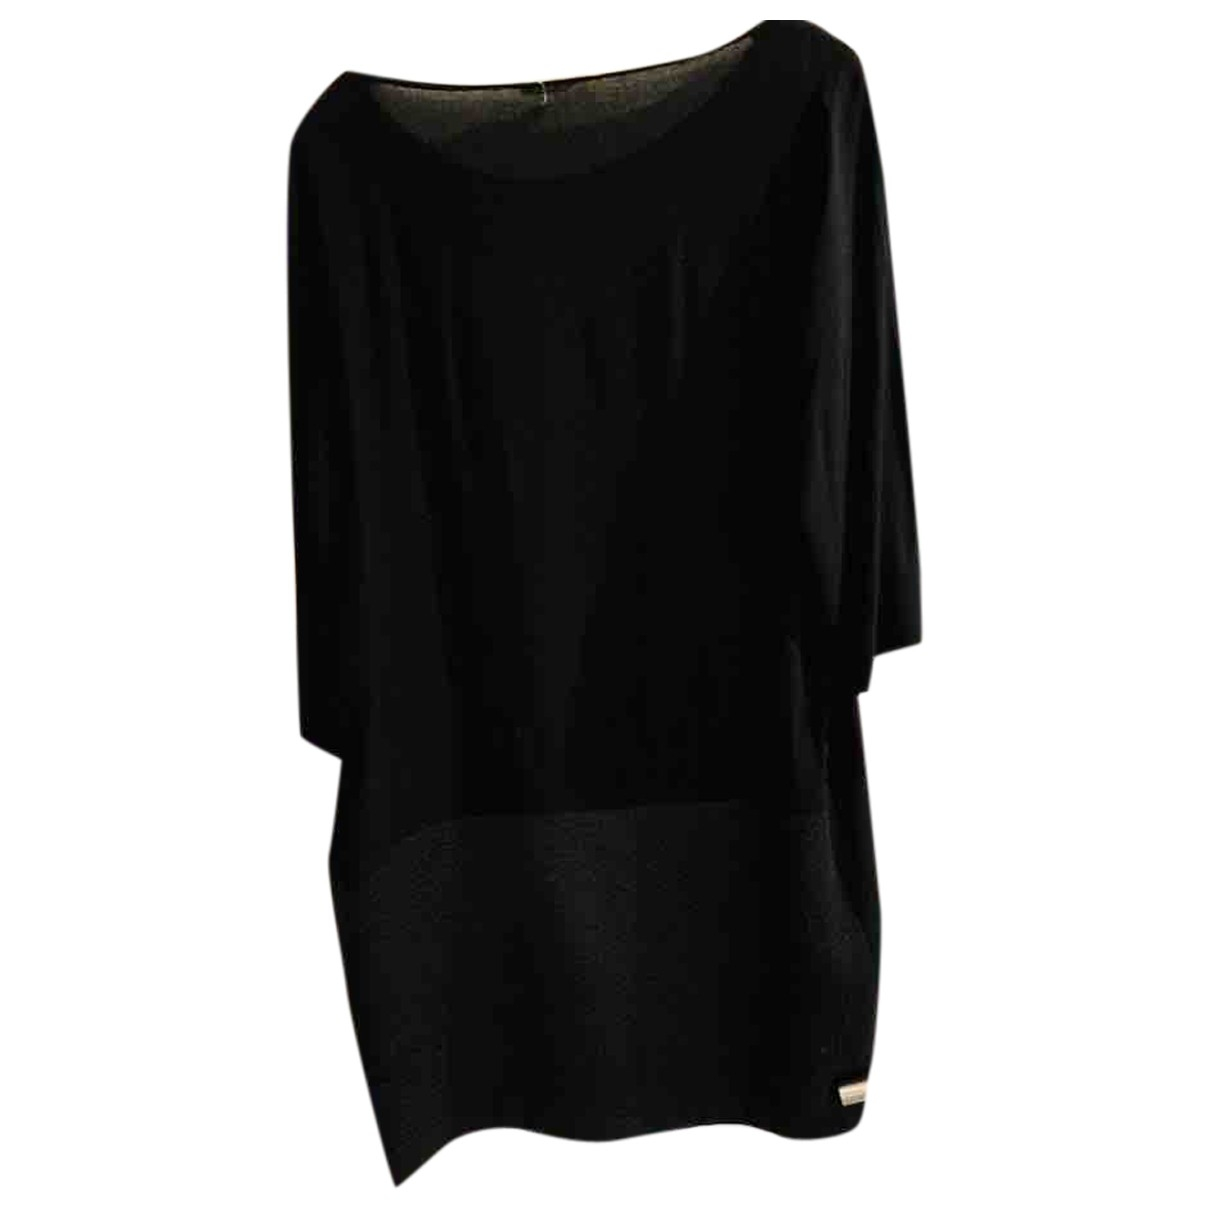 Ba&sh \N Black dress for Women L International